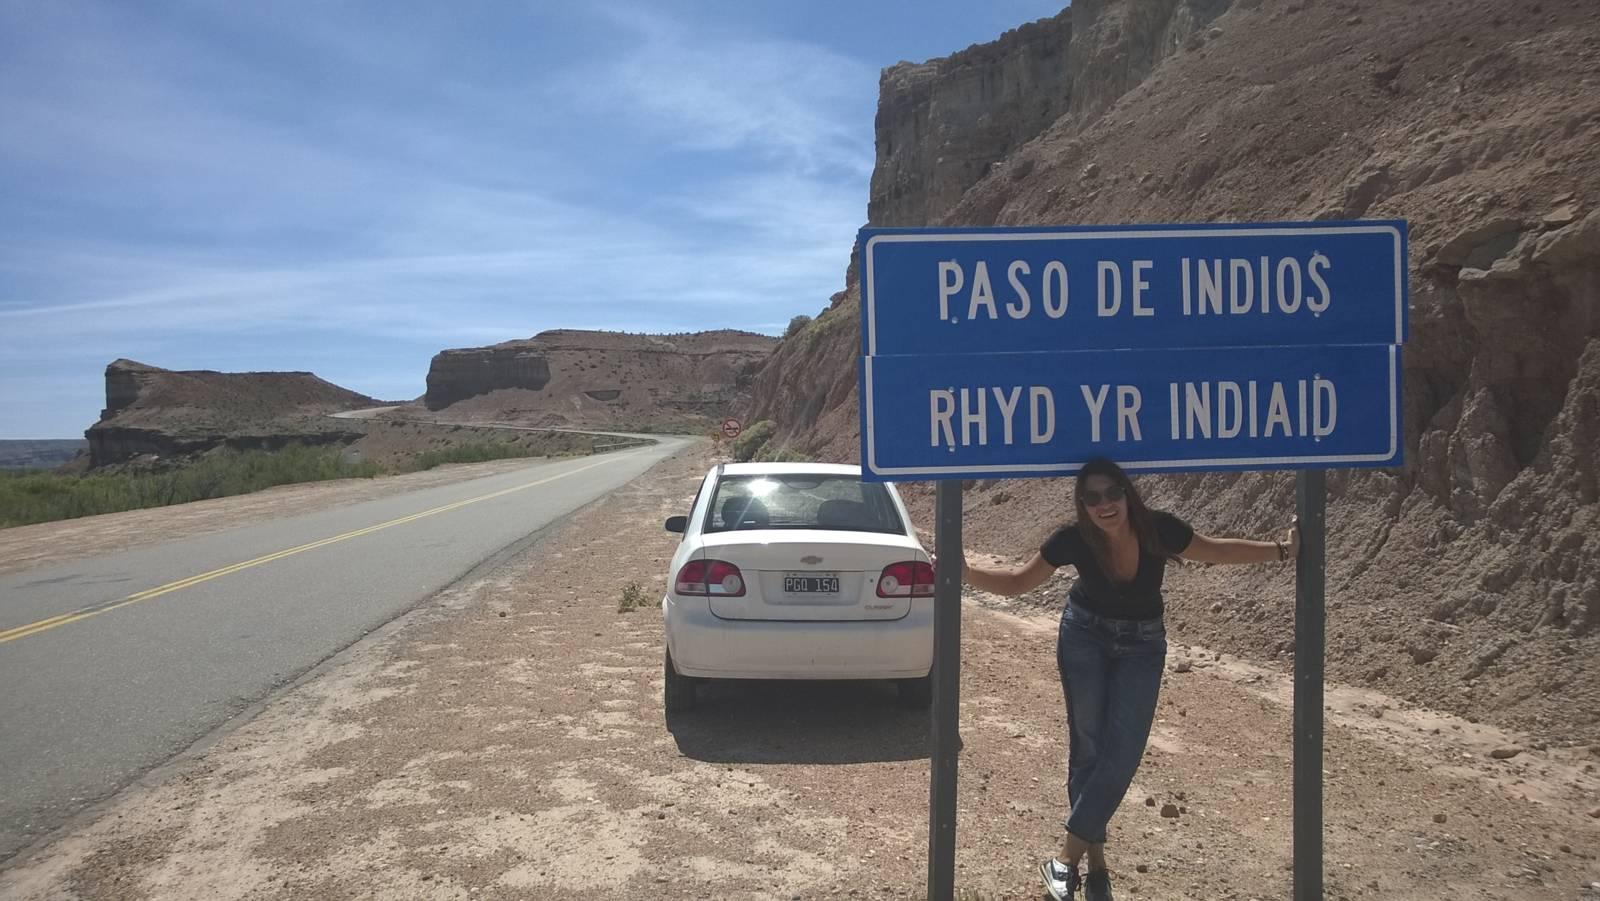 Argentina-Patagonia-Rio-Negro-Paso-de-Indios